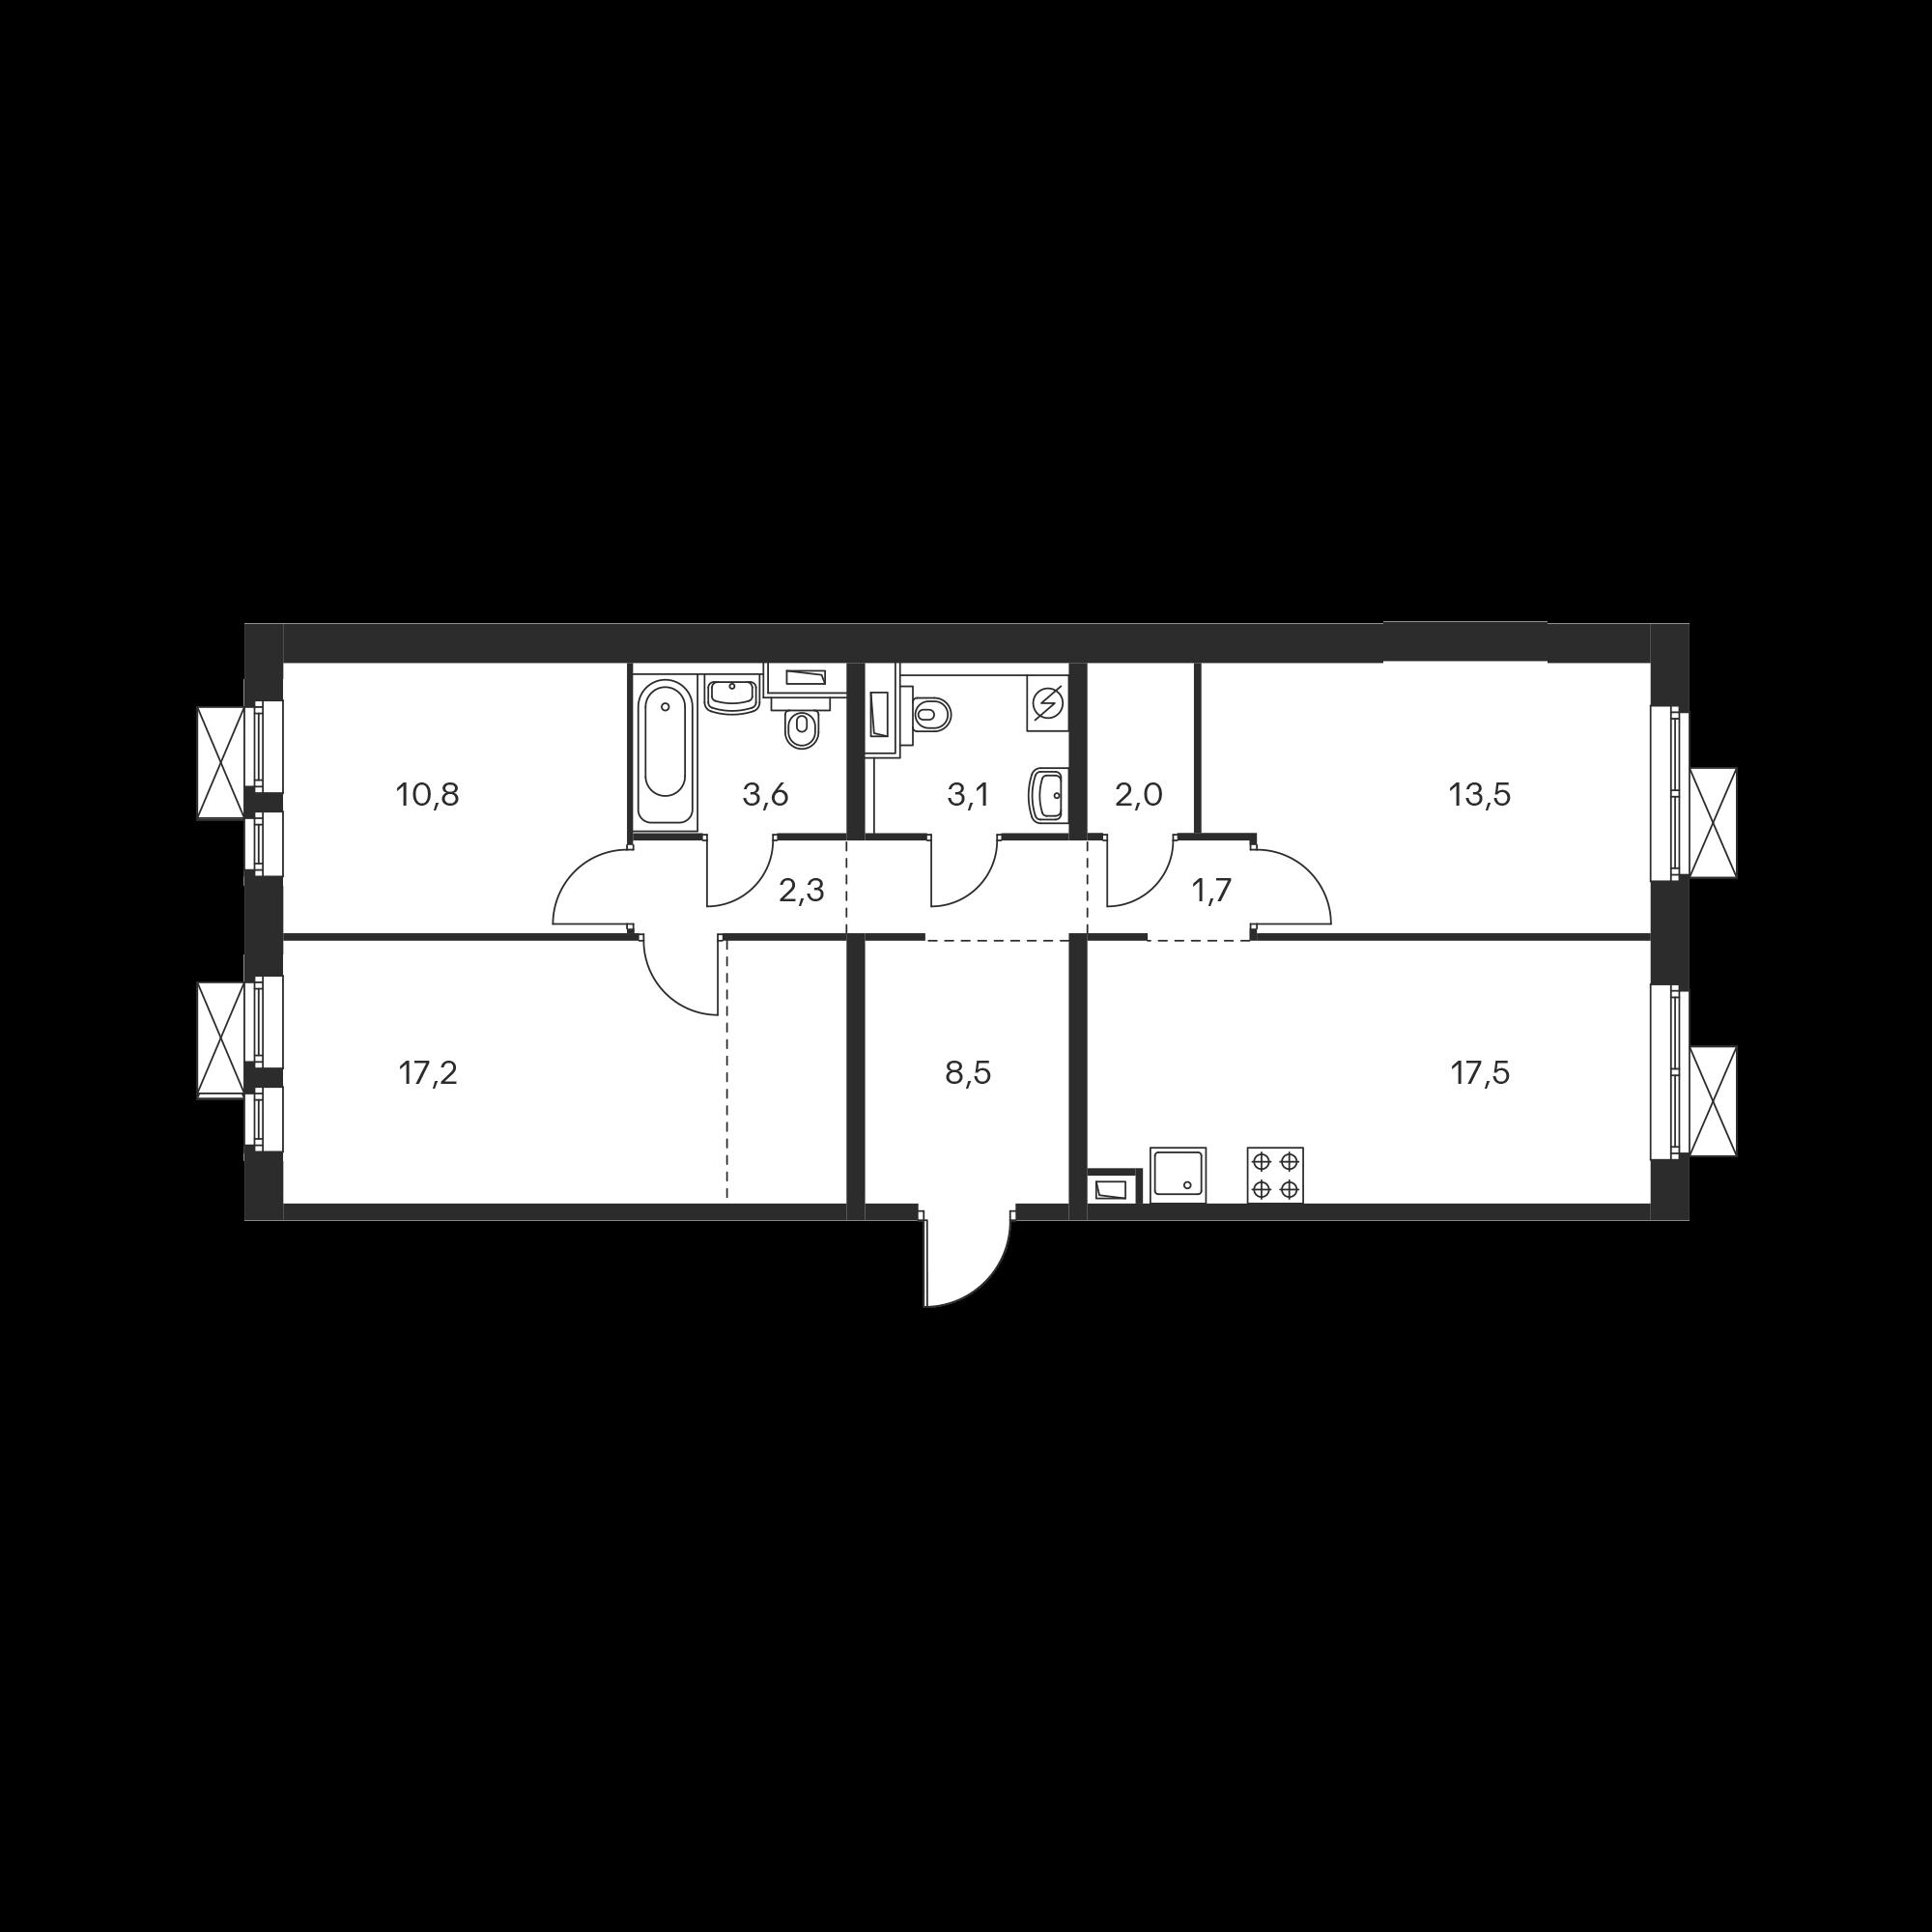 3KM16_6.0-2